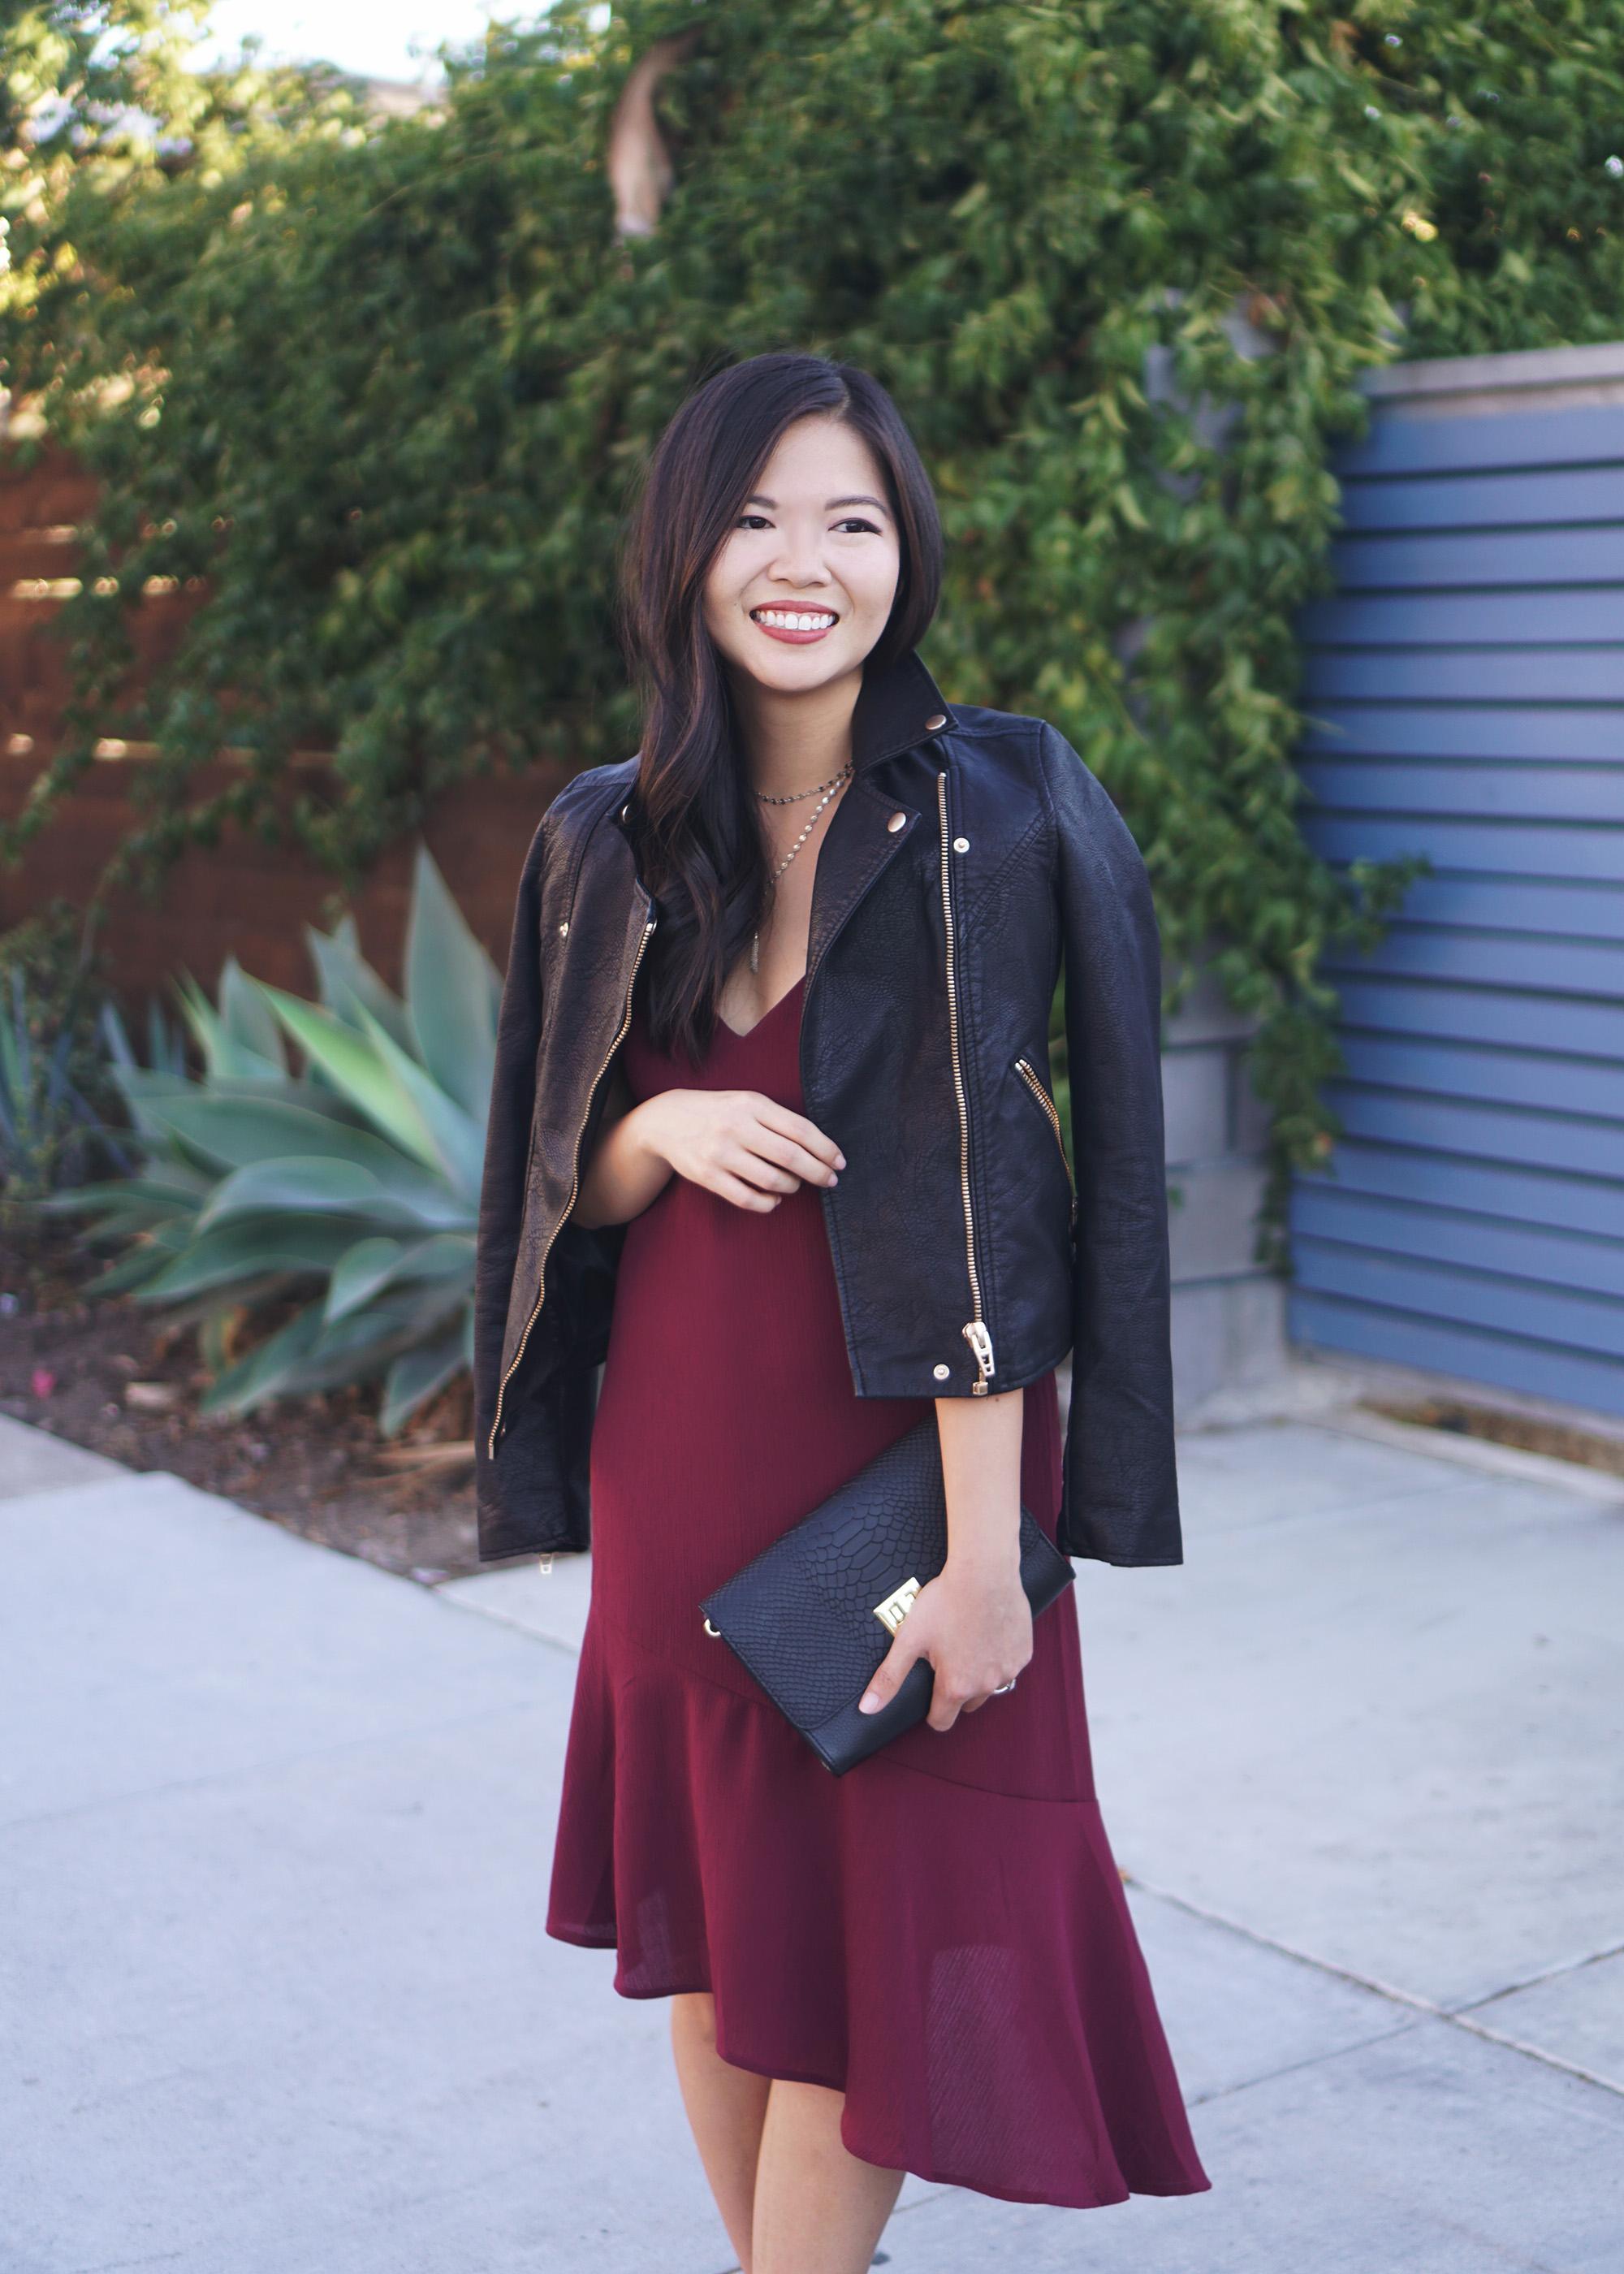 Fall Fashion: Leather Jacket & Burgundy Dress